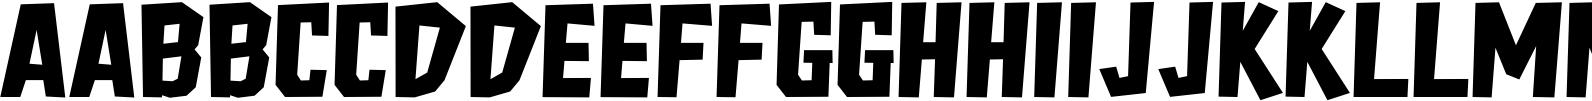 Freich